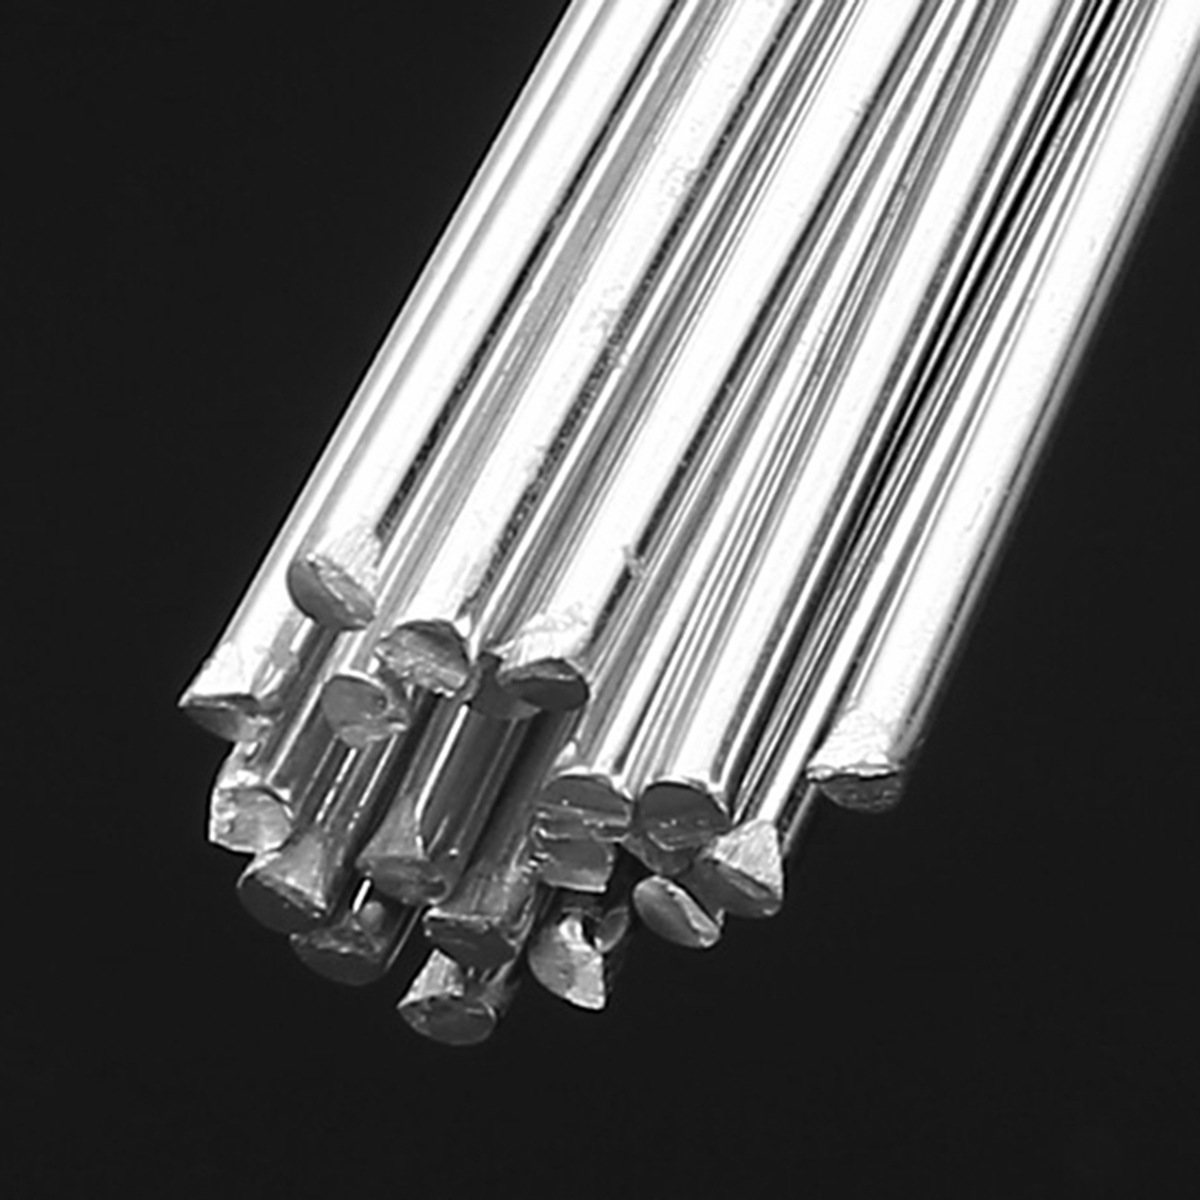 ANLIS Accessori per Saldatura a Polvere per Saldatura a Bassa Temperatura per brasatura di Alluminio Bianco